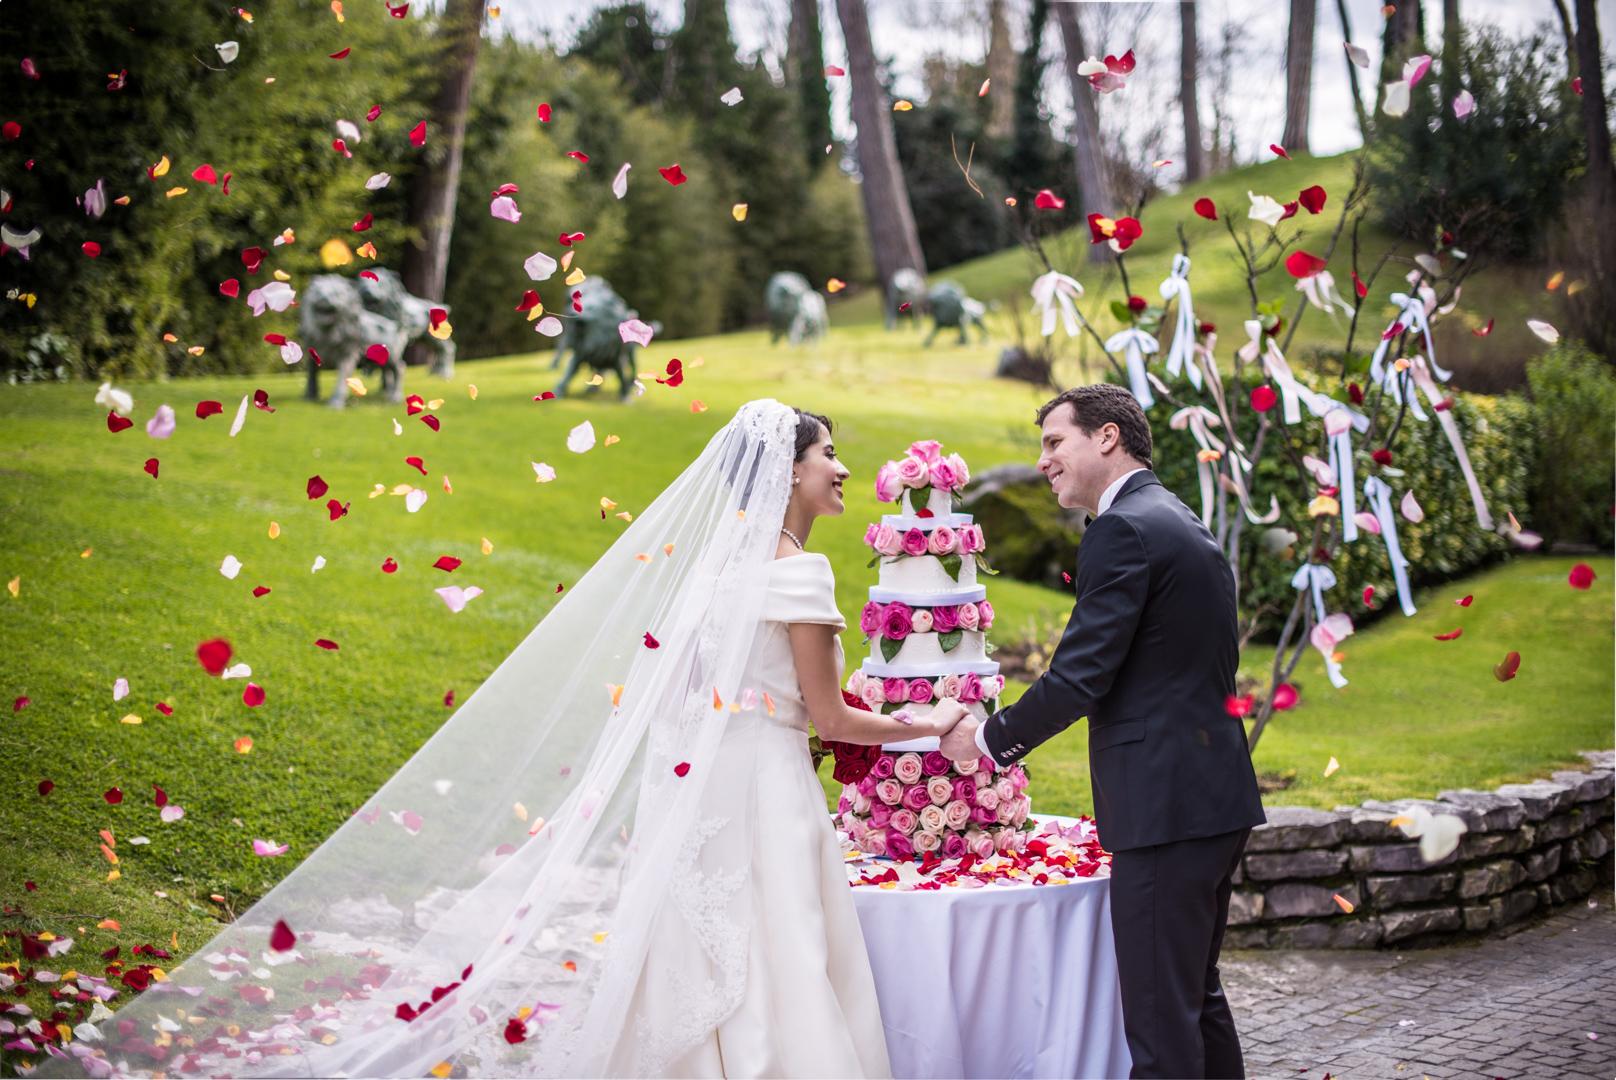 Rome Cavalieri Waldorf Astoria | A Waldorf Wedding